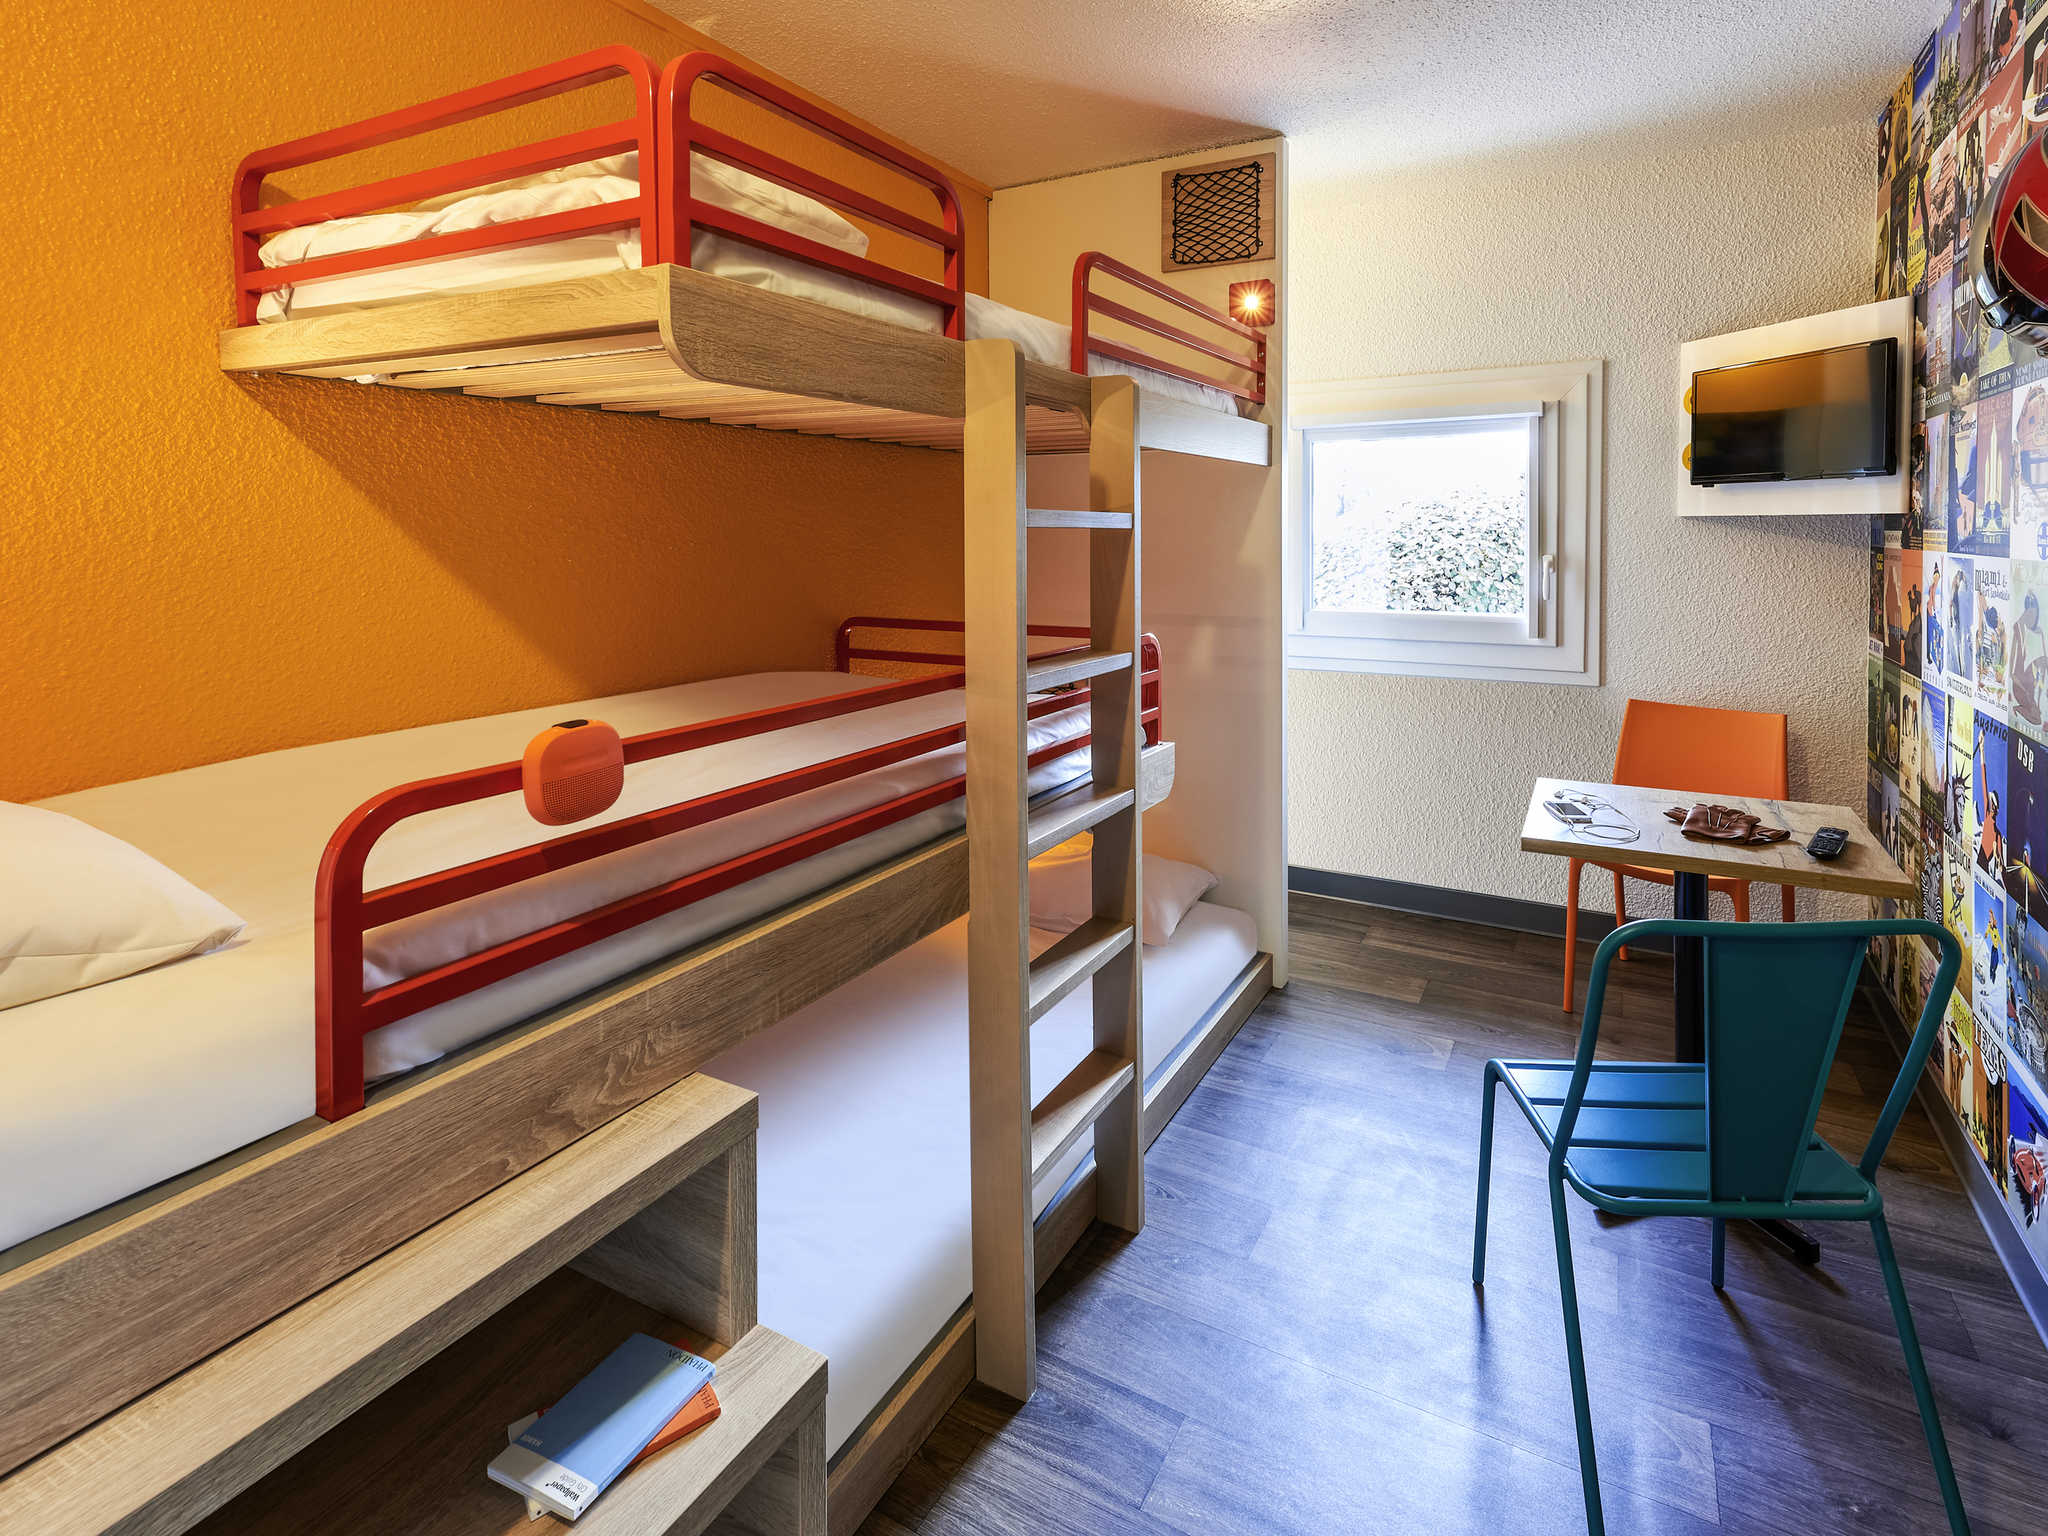 Hotel in bagnolet hotelf1 parijs porte de montreuil - Formule 1 porte de montreuil ...